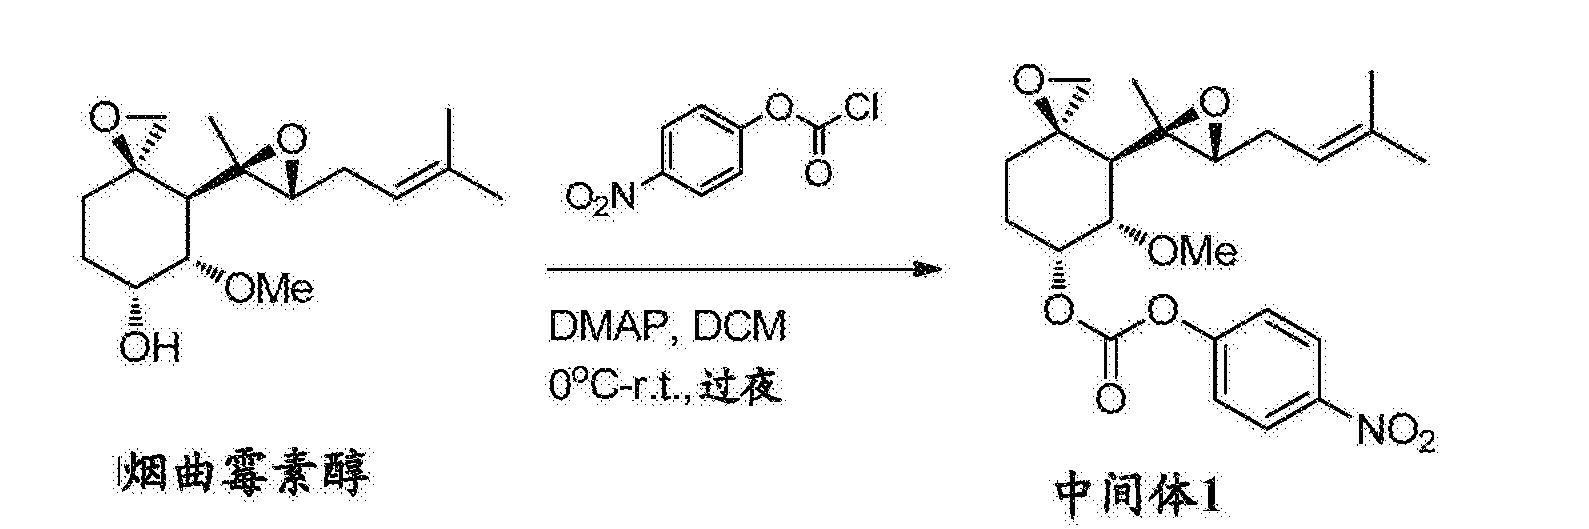 Figure CN106432255AD00282